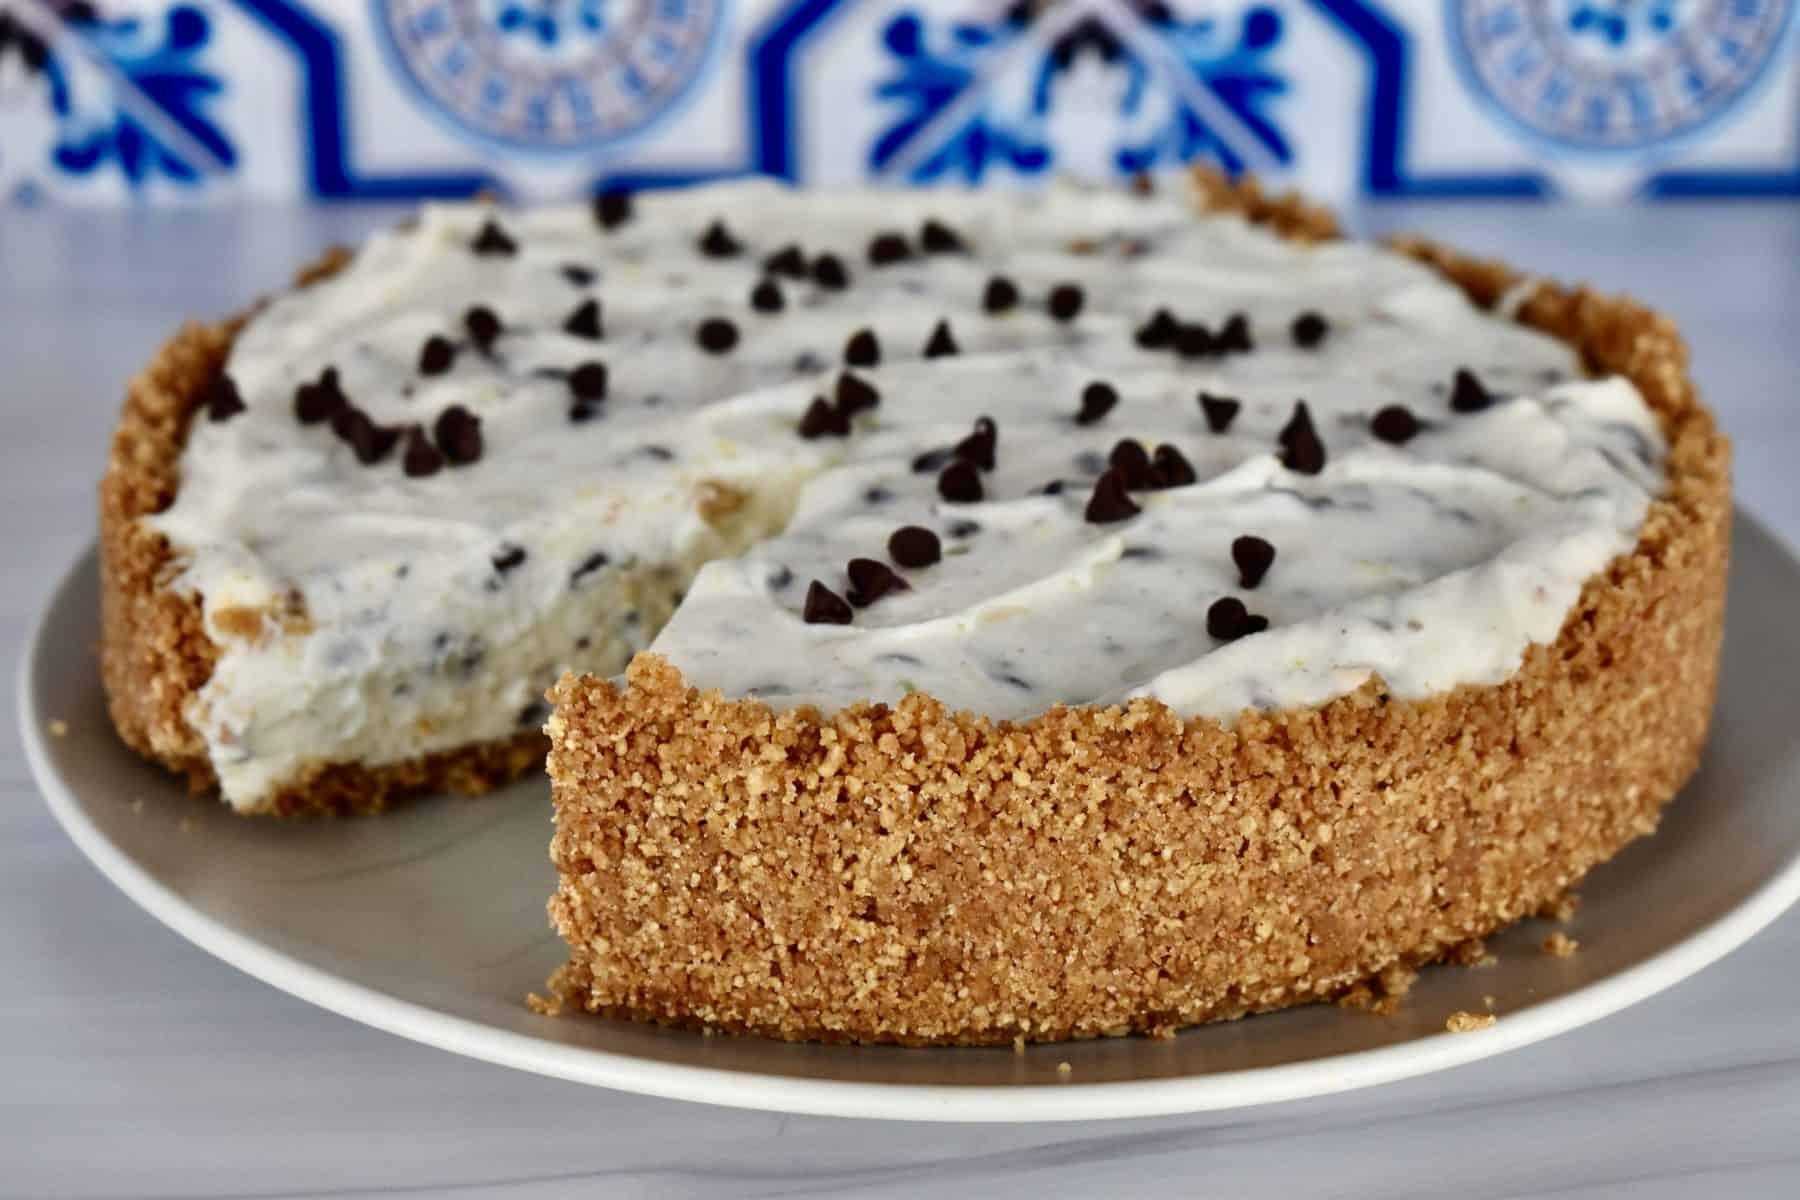 No Bake Cannoli Cheesecake on a plate.